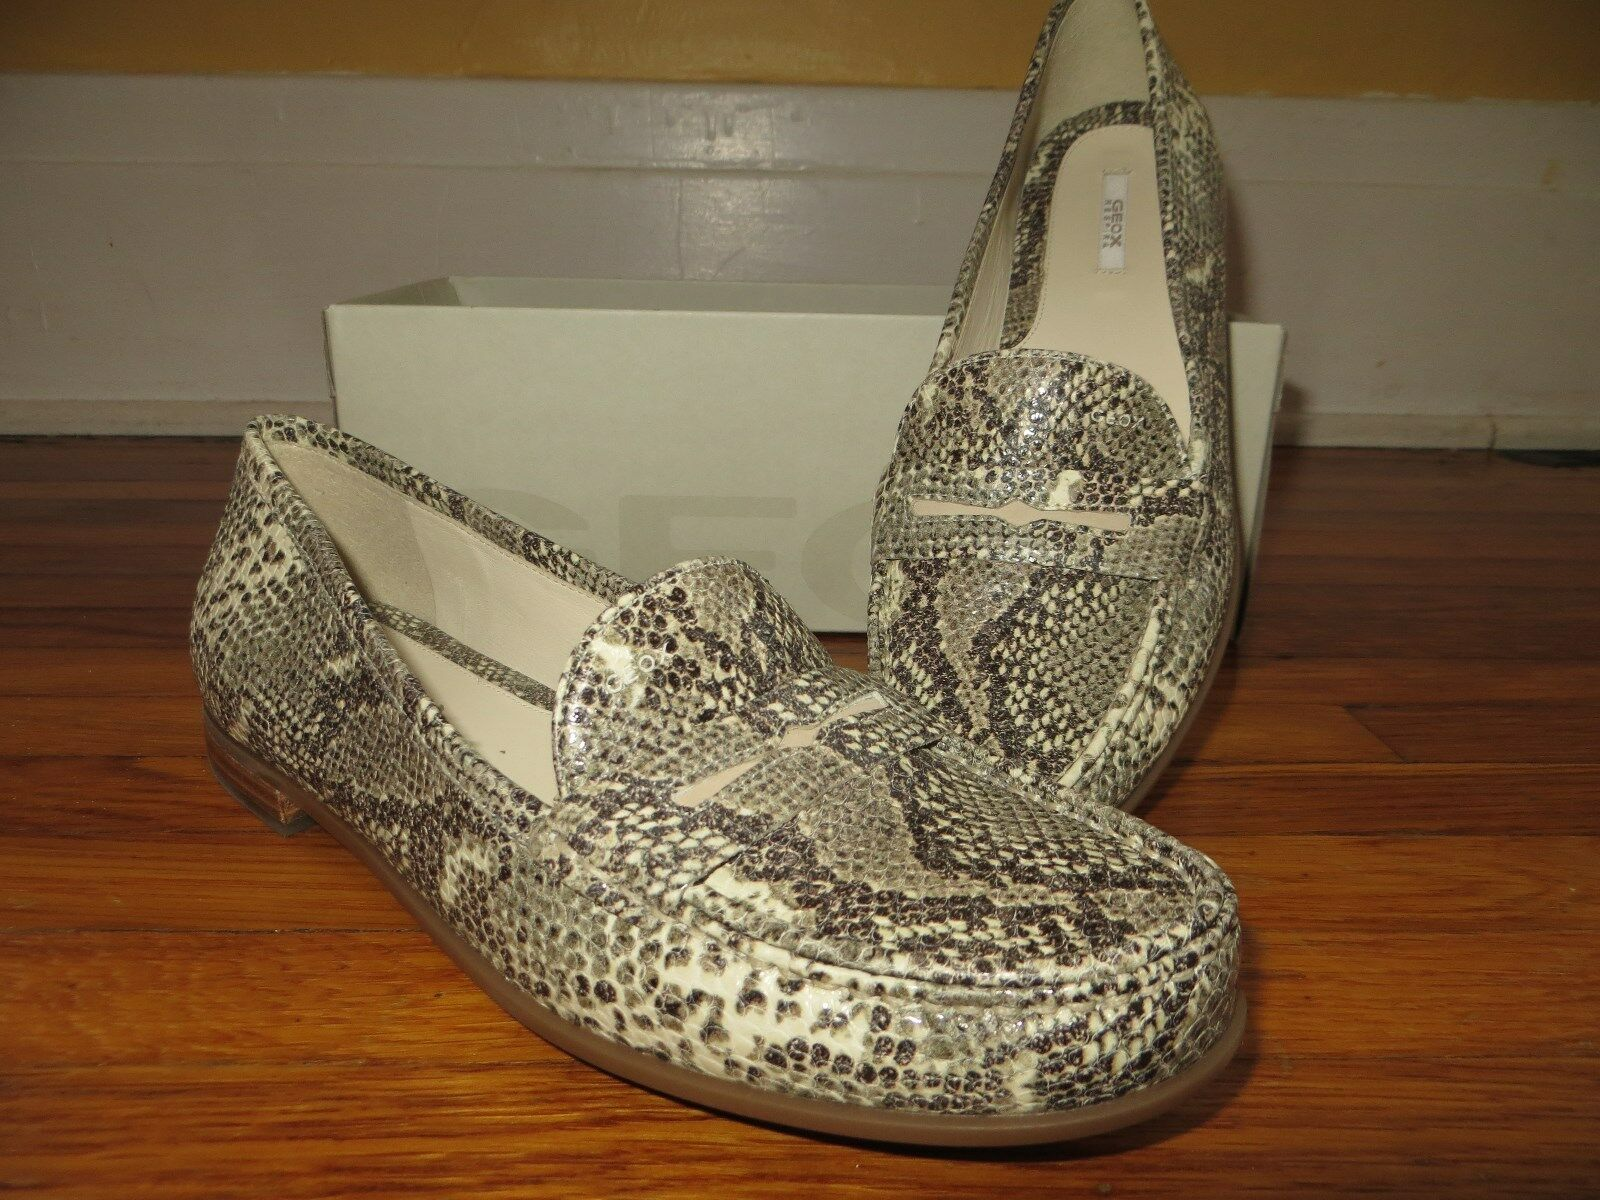 negozio online NIB NIB NIB NEW Geox Respira Loafers Donna  Snake Design Leather Moccasins scarpe 9.5 US  più ordine